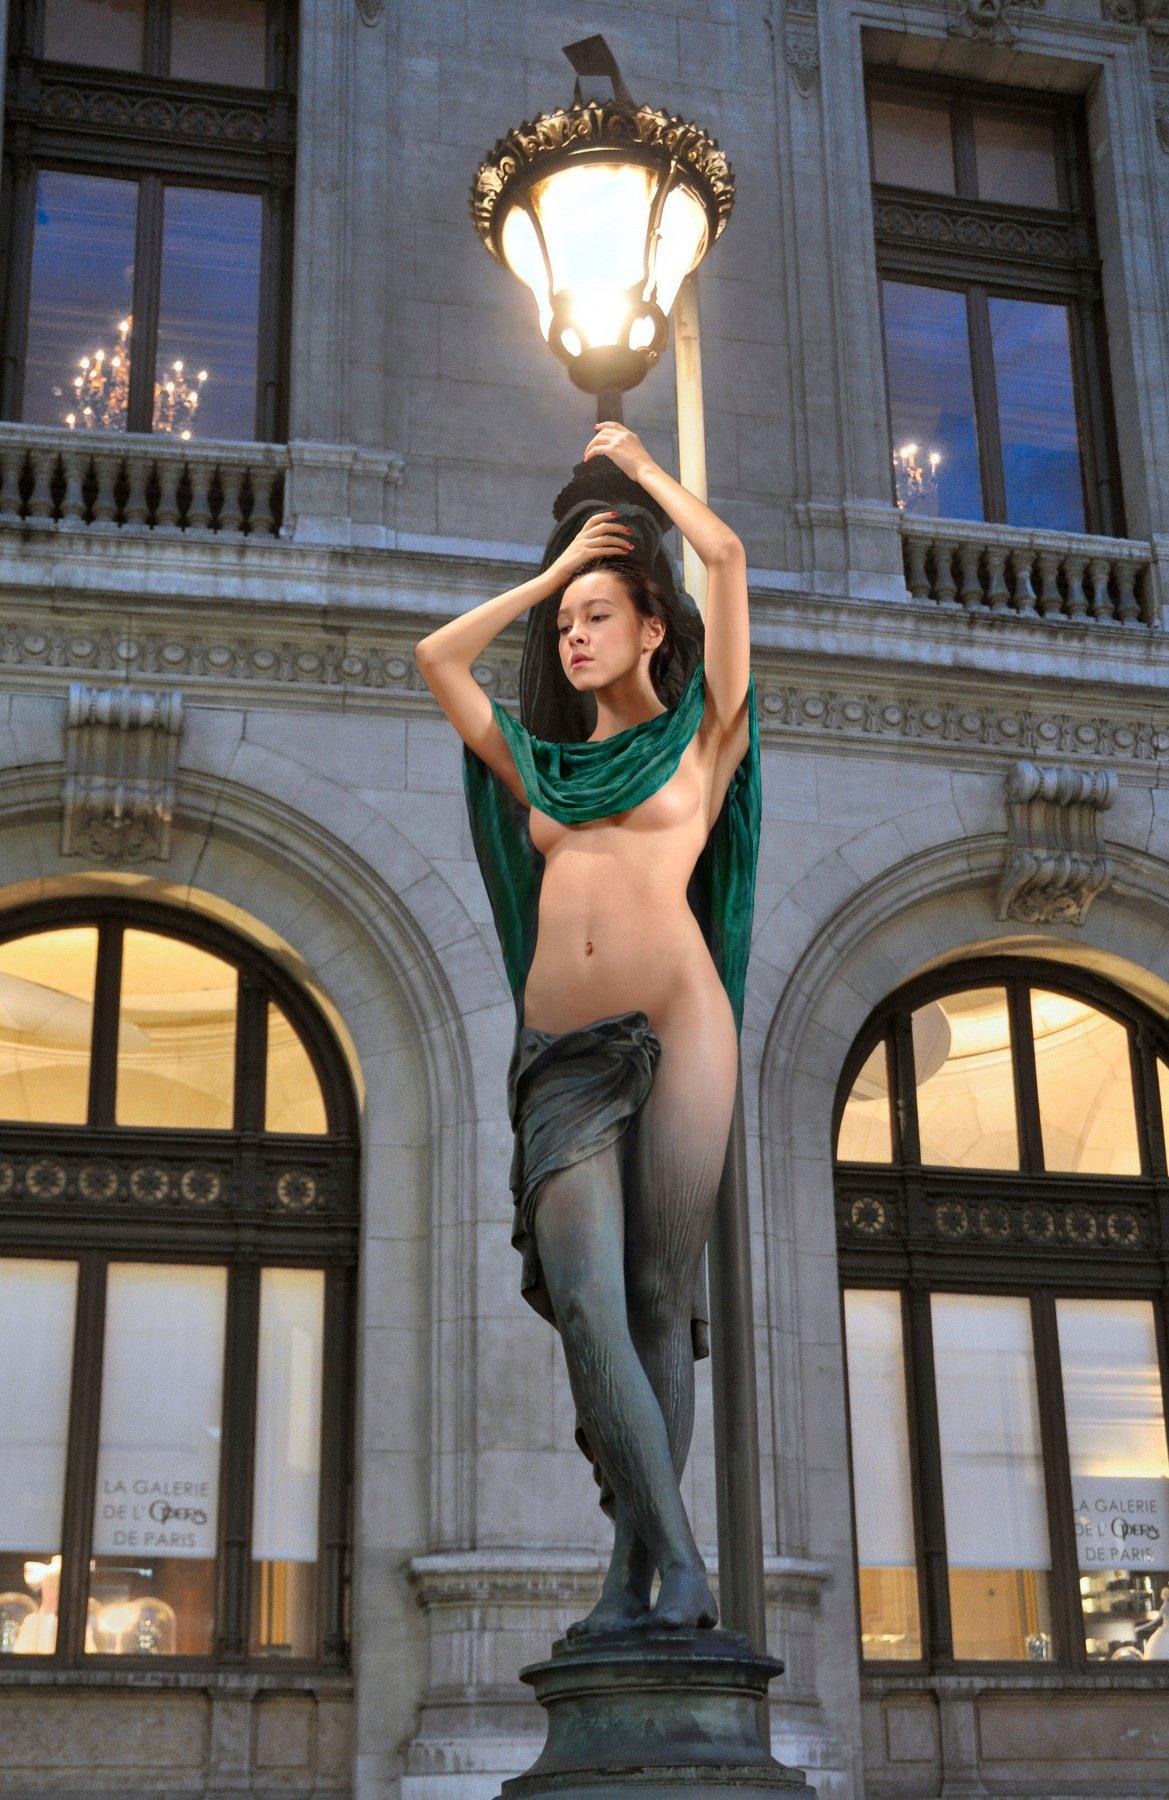 sculpture, art, bronse, statue, lamp, evening, girl, nude, model, posing, paris, opera, collage, Endegor